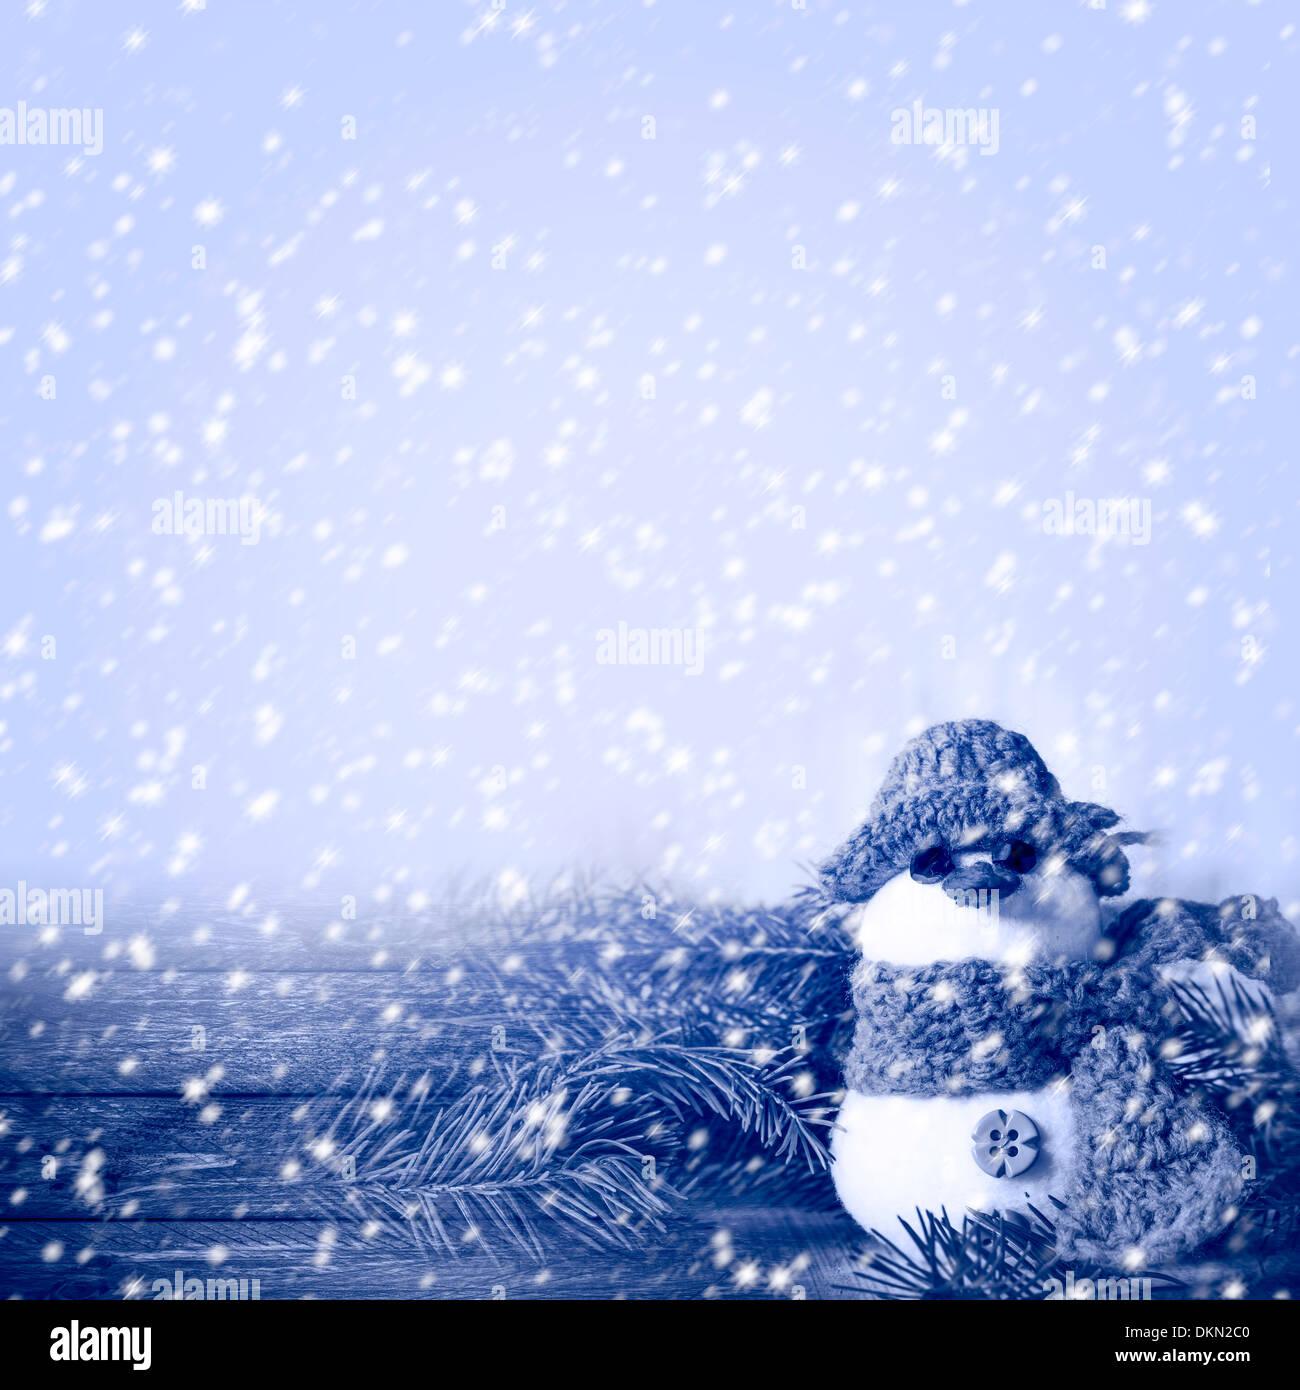 WallpapersWide.com | Winter HD Desktop Wallpapers for ...